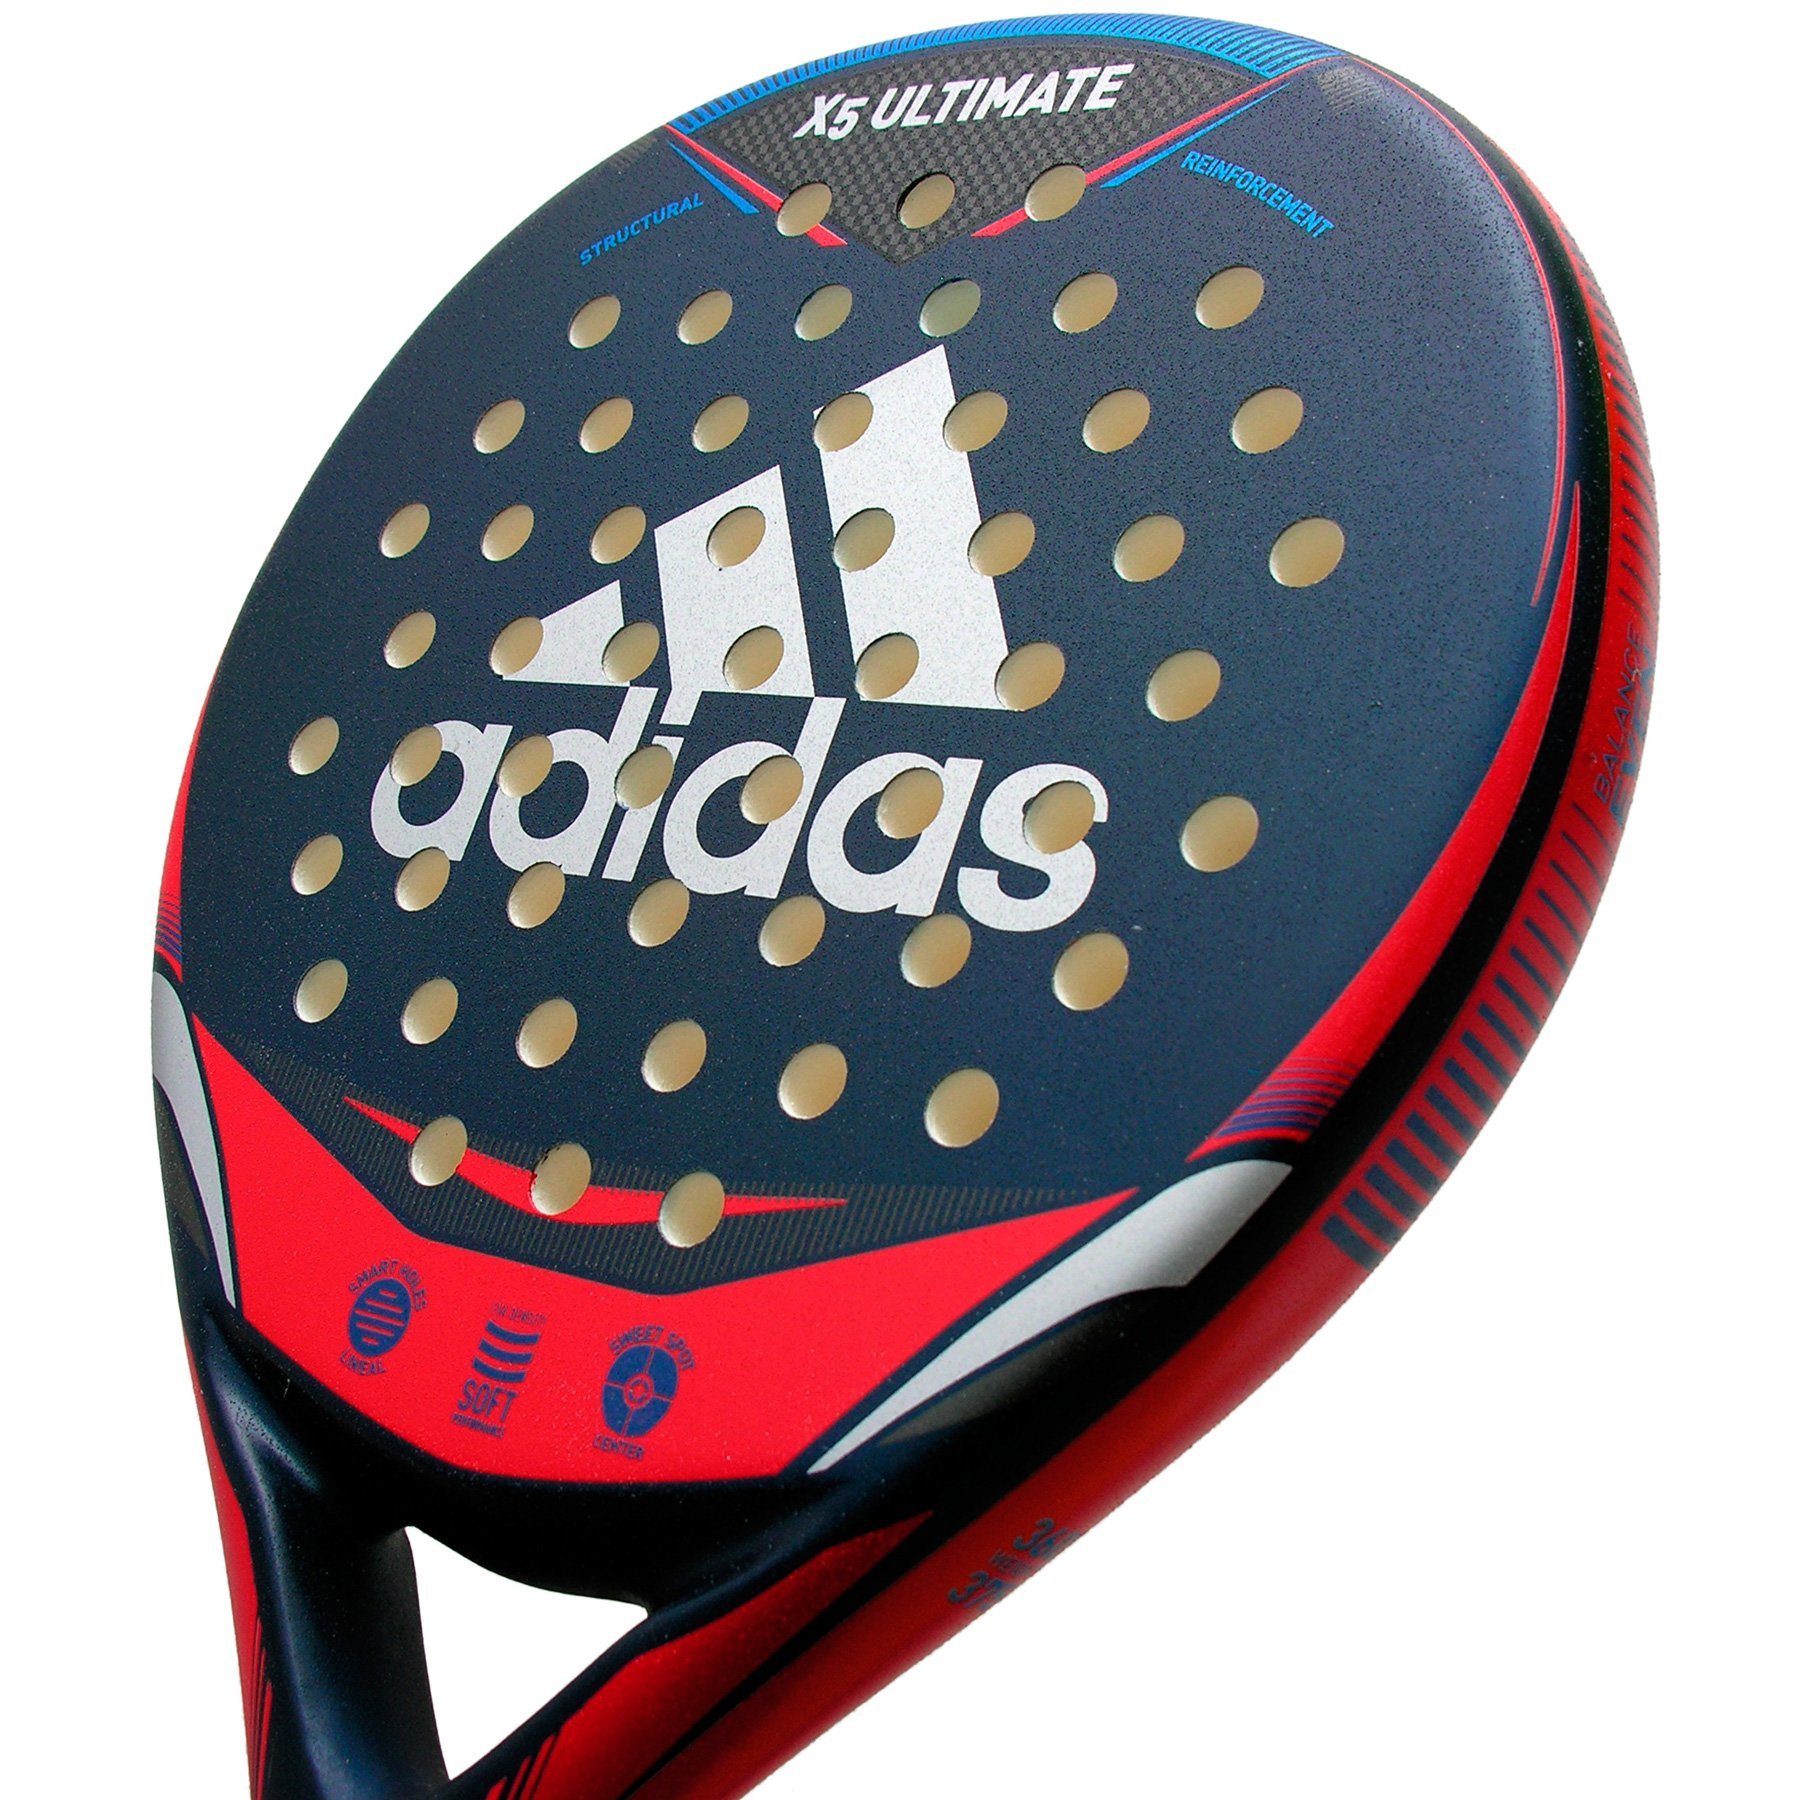 Pala Adidas X5 Ultimate Red 2018 product image